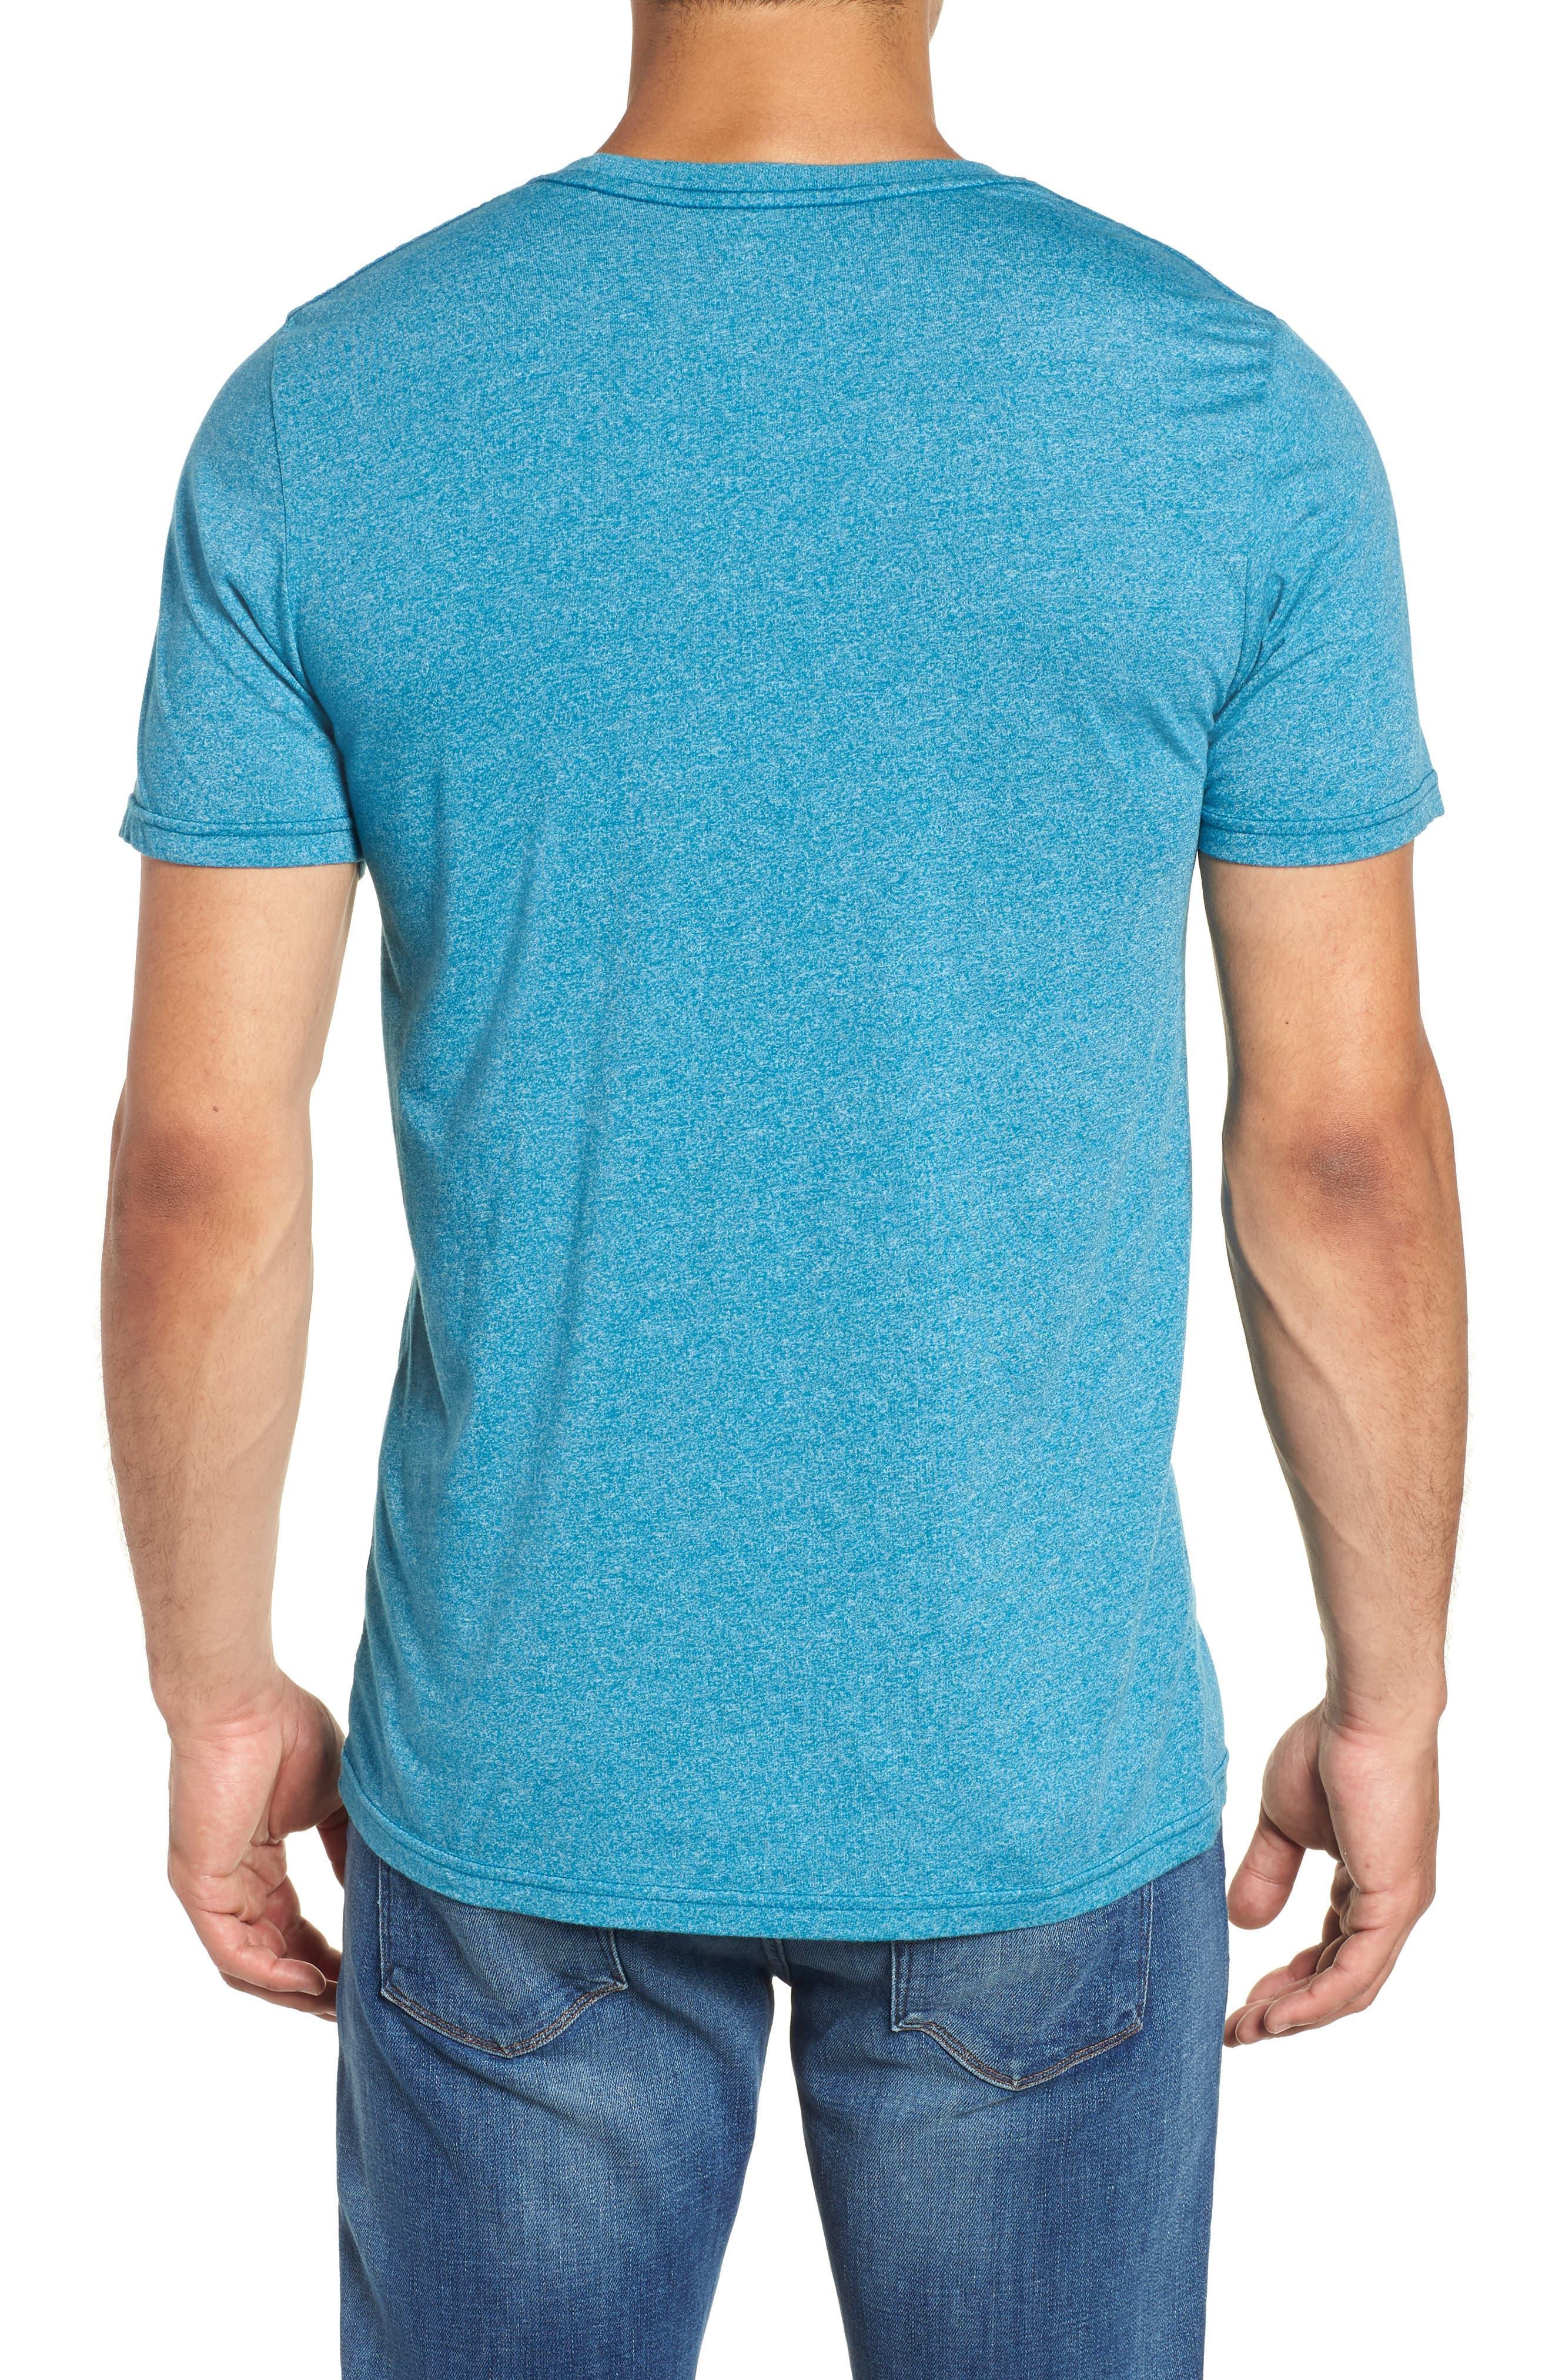 Skullapple Mock Twist T-Shirt,                             Alternate thumbnail 2, color,                             440